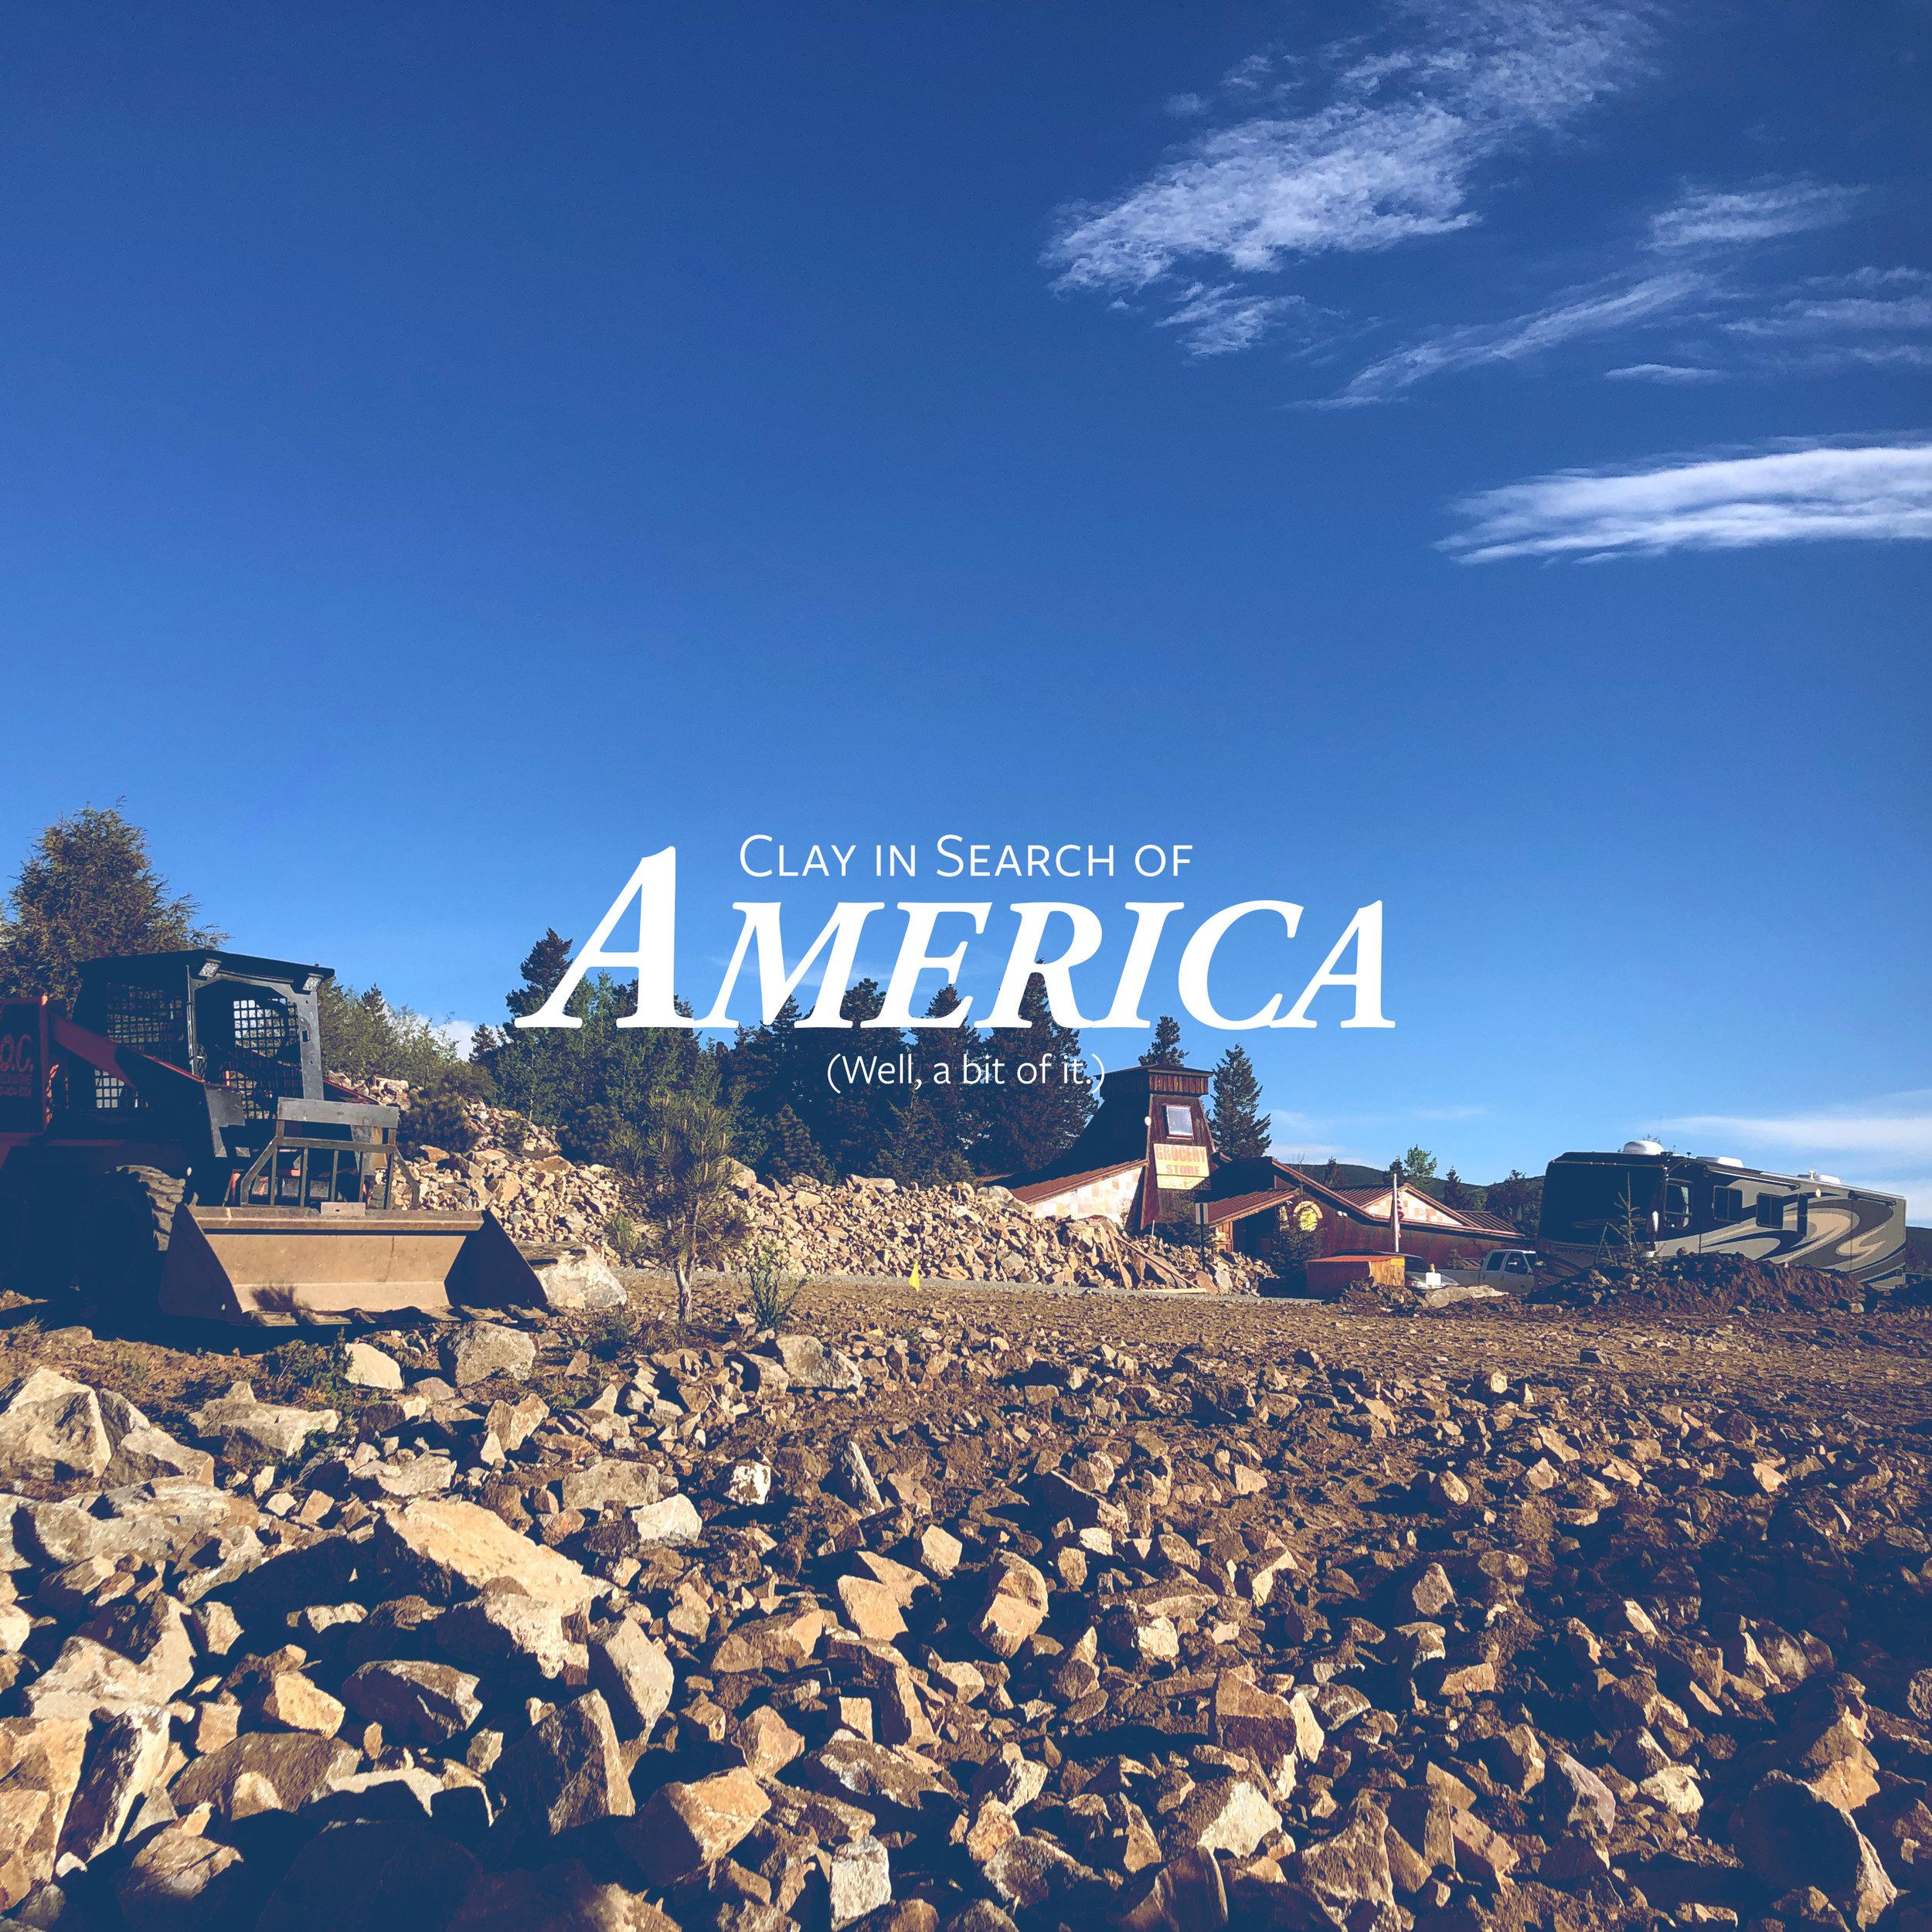 America 9.jpg